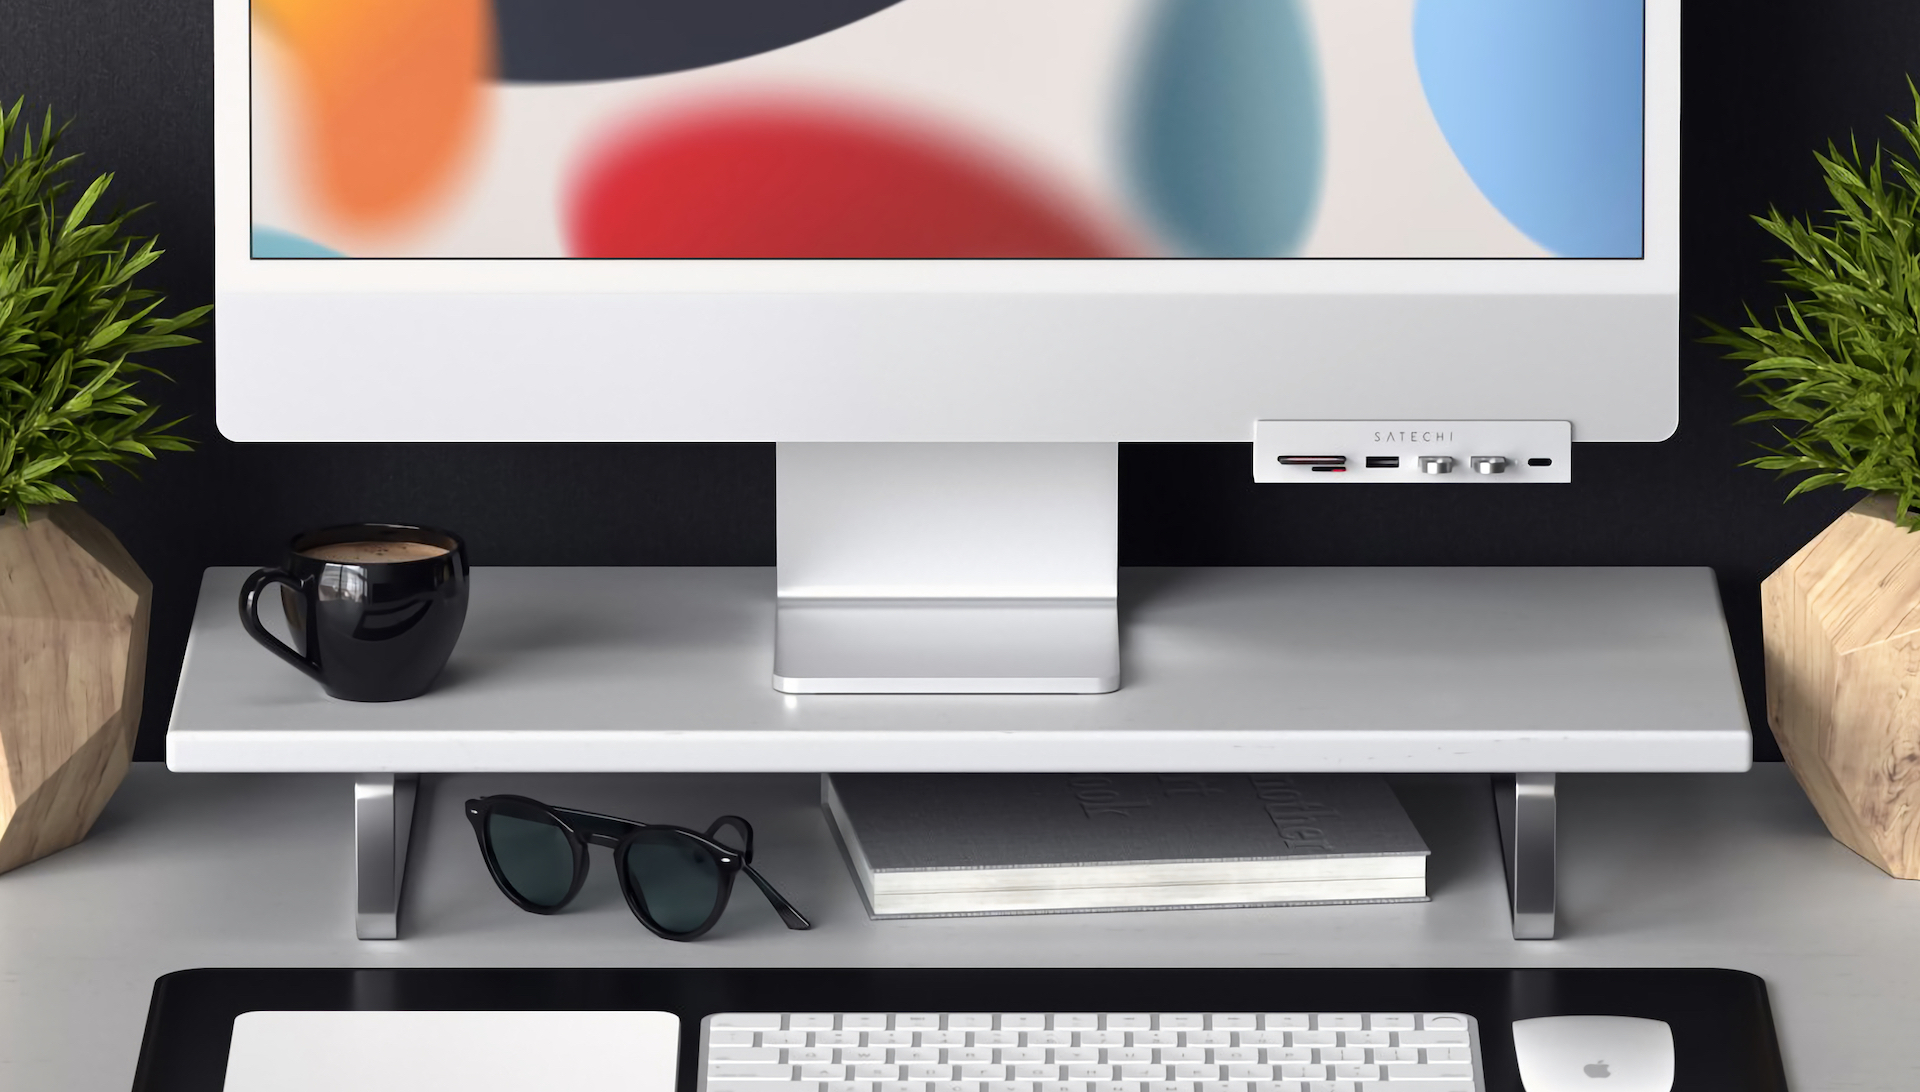 Satechi USB-C Clamp Hub for 24-inch iMac